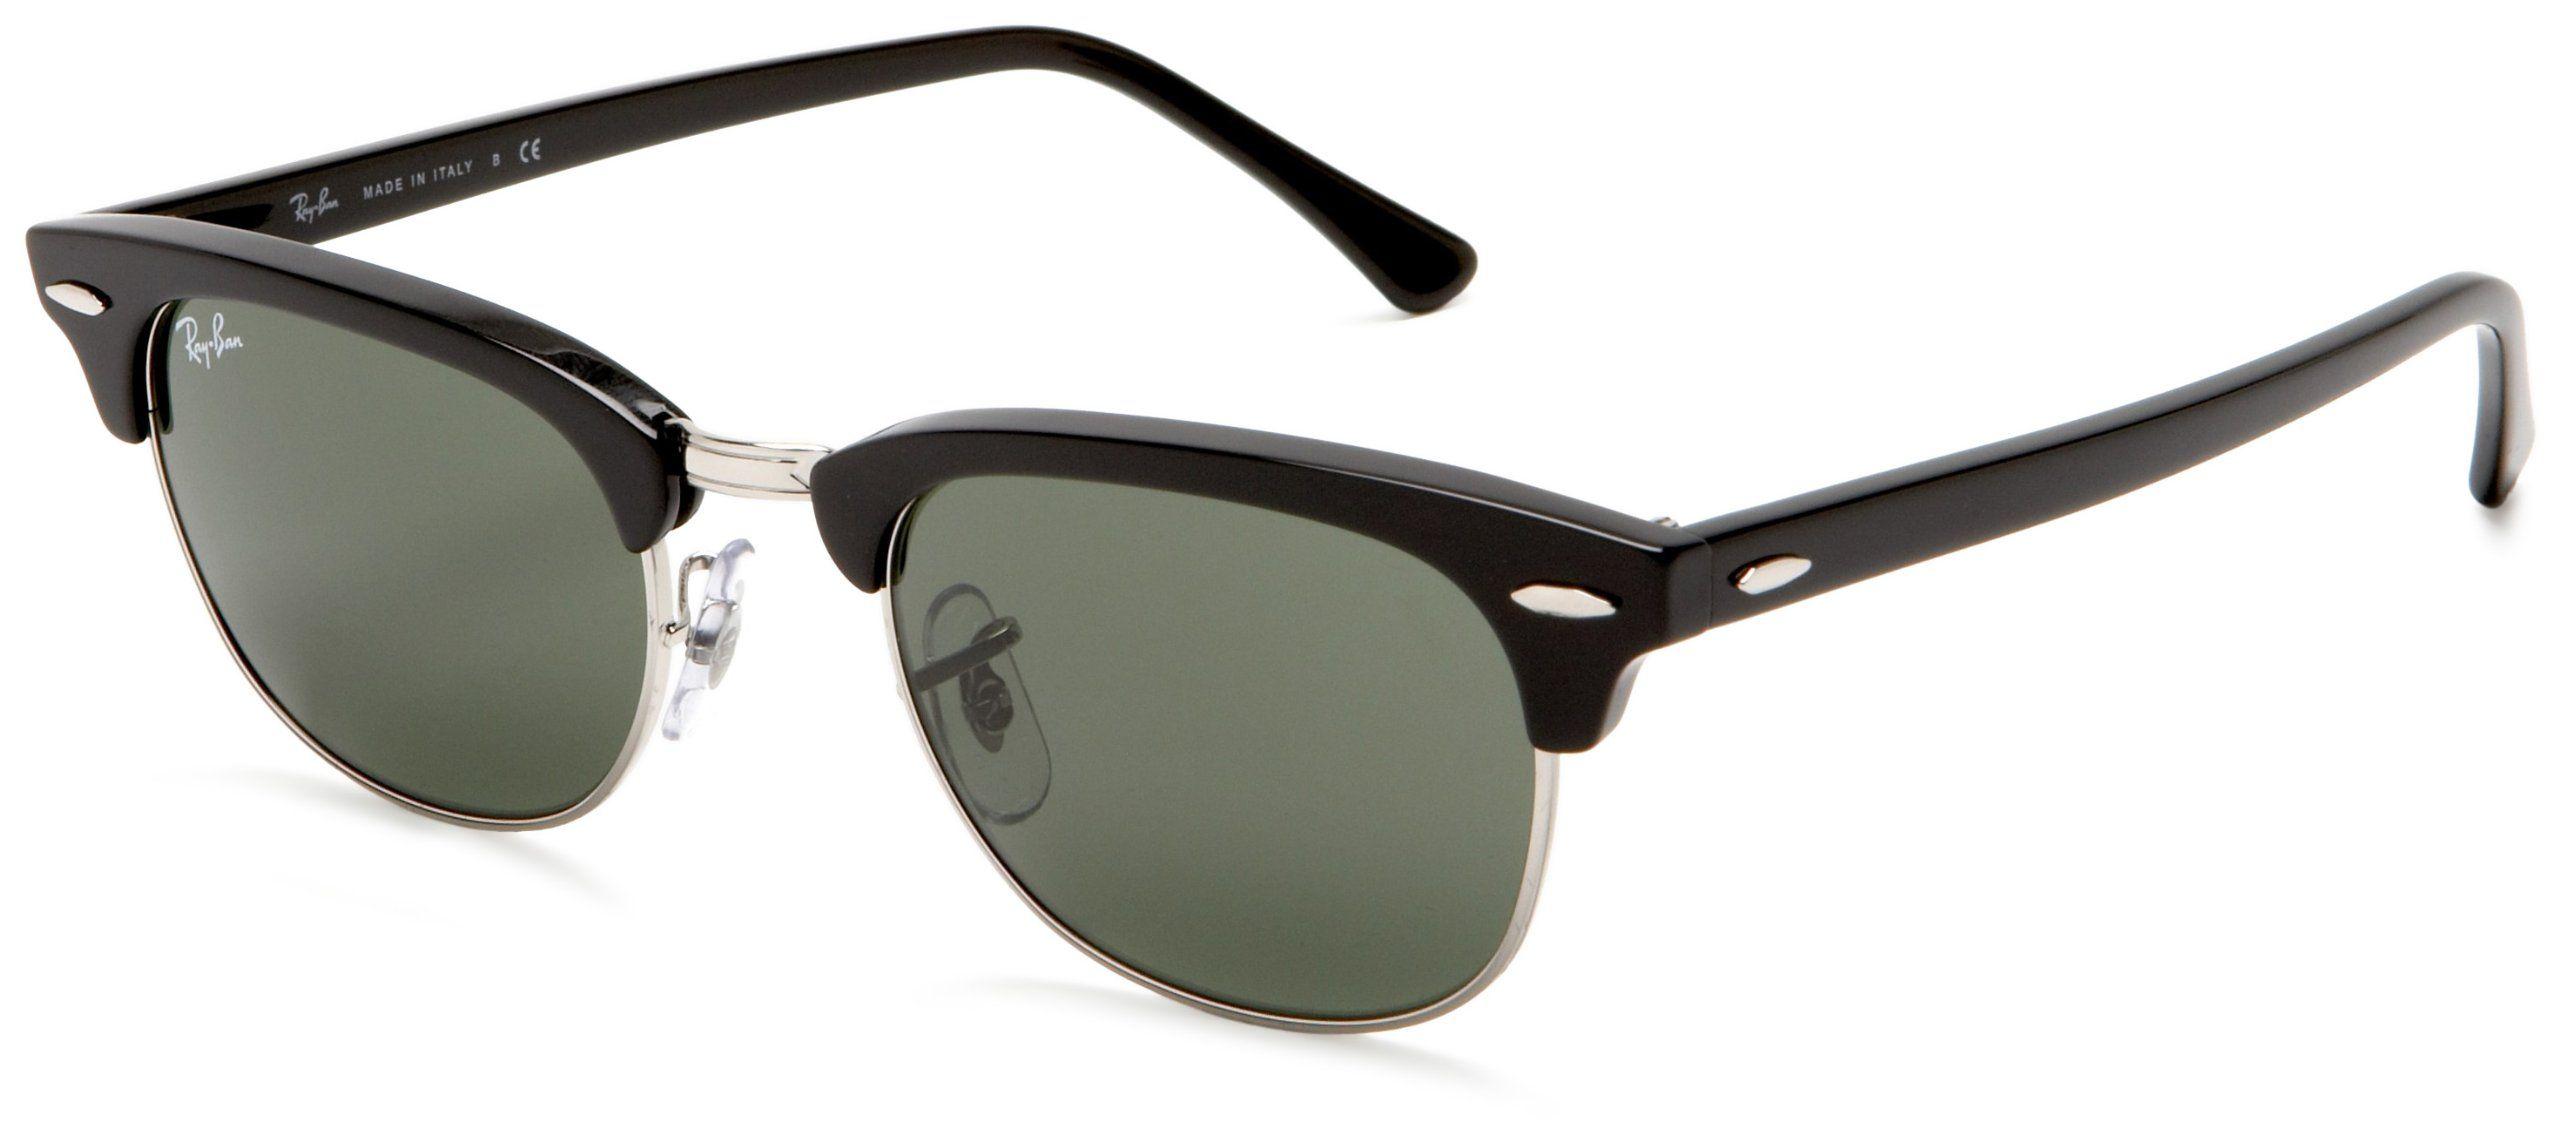 8174b379419 Ray-Ban New Clubmaster Sunglasses -  125